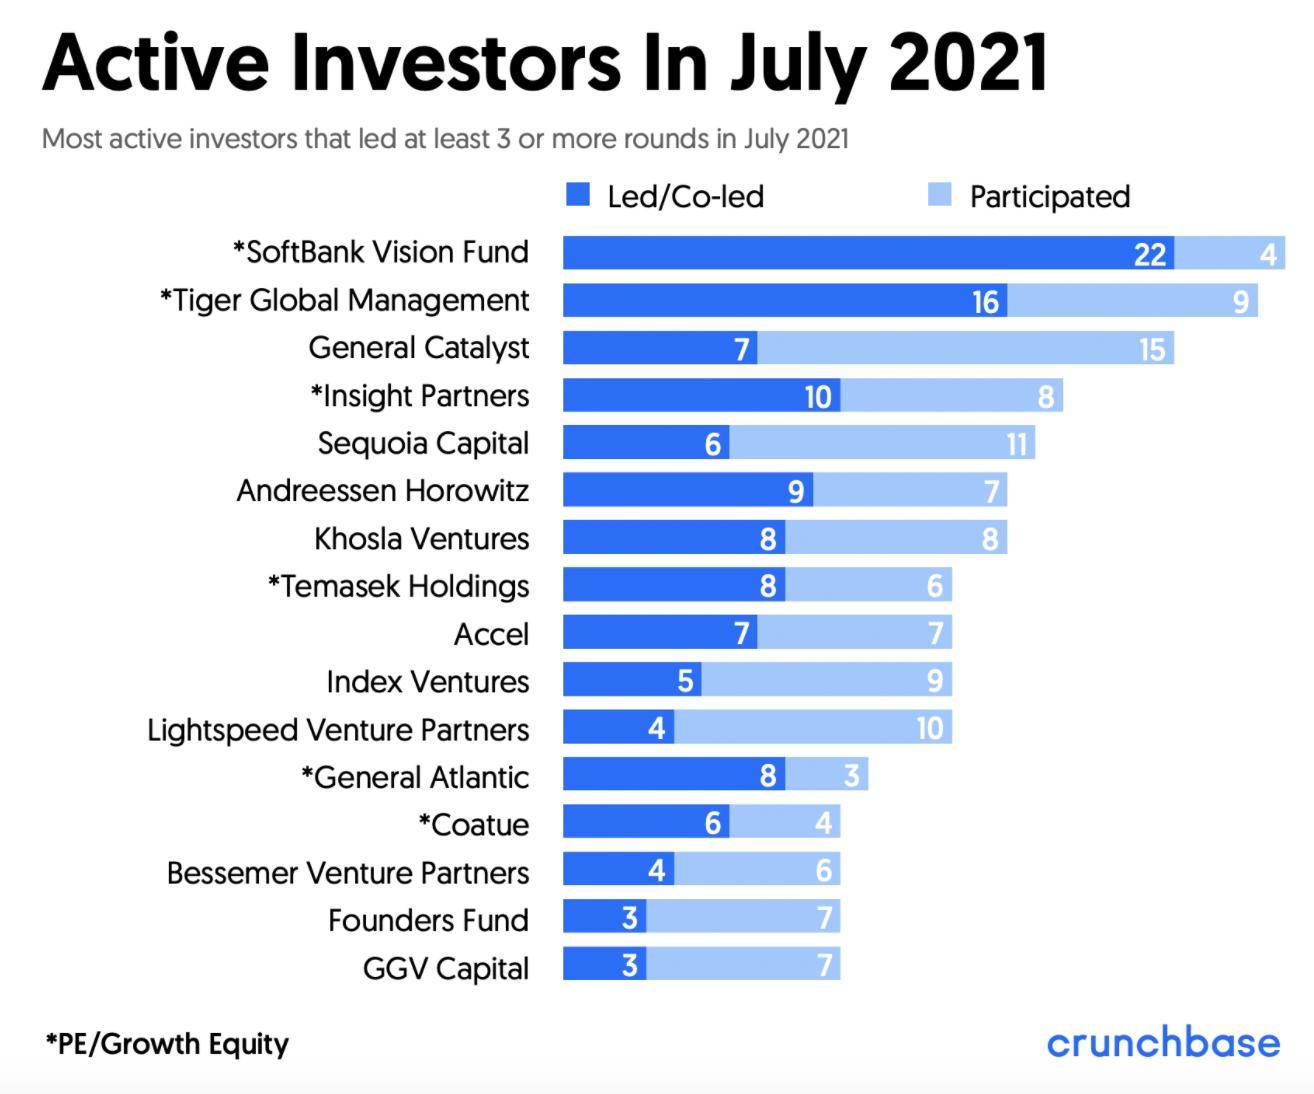 Active Investors In July 2021